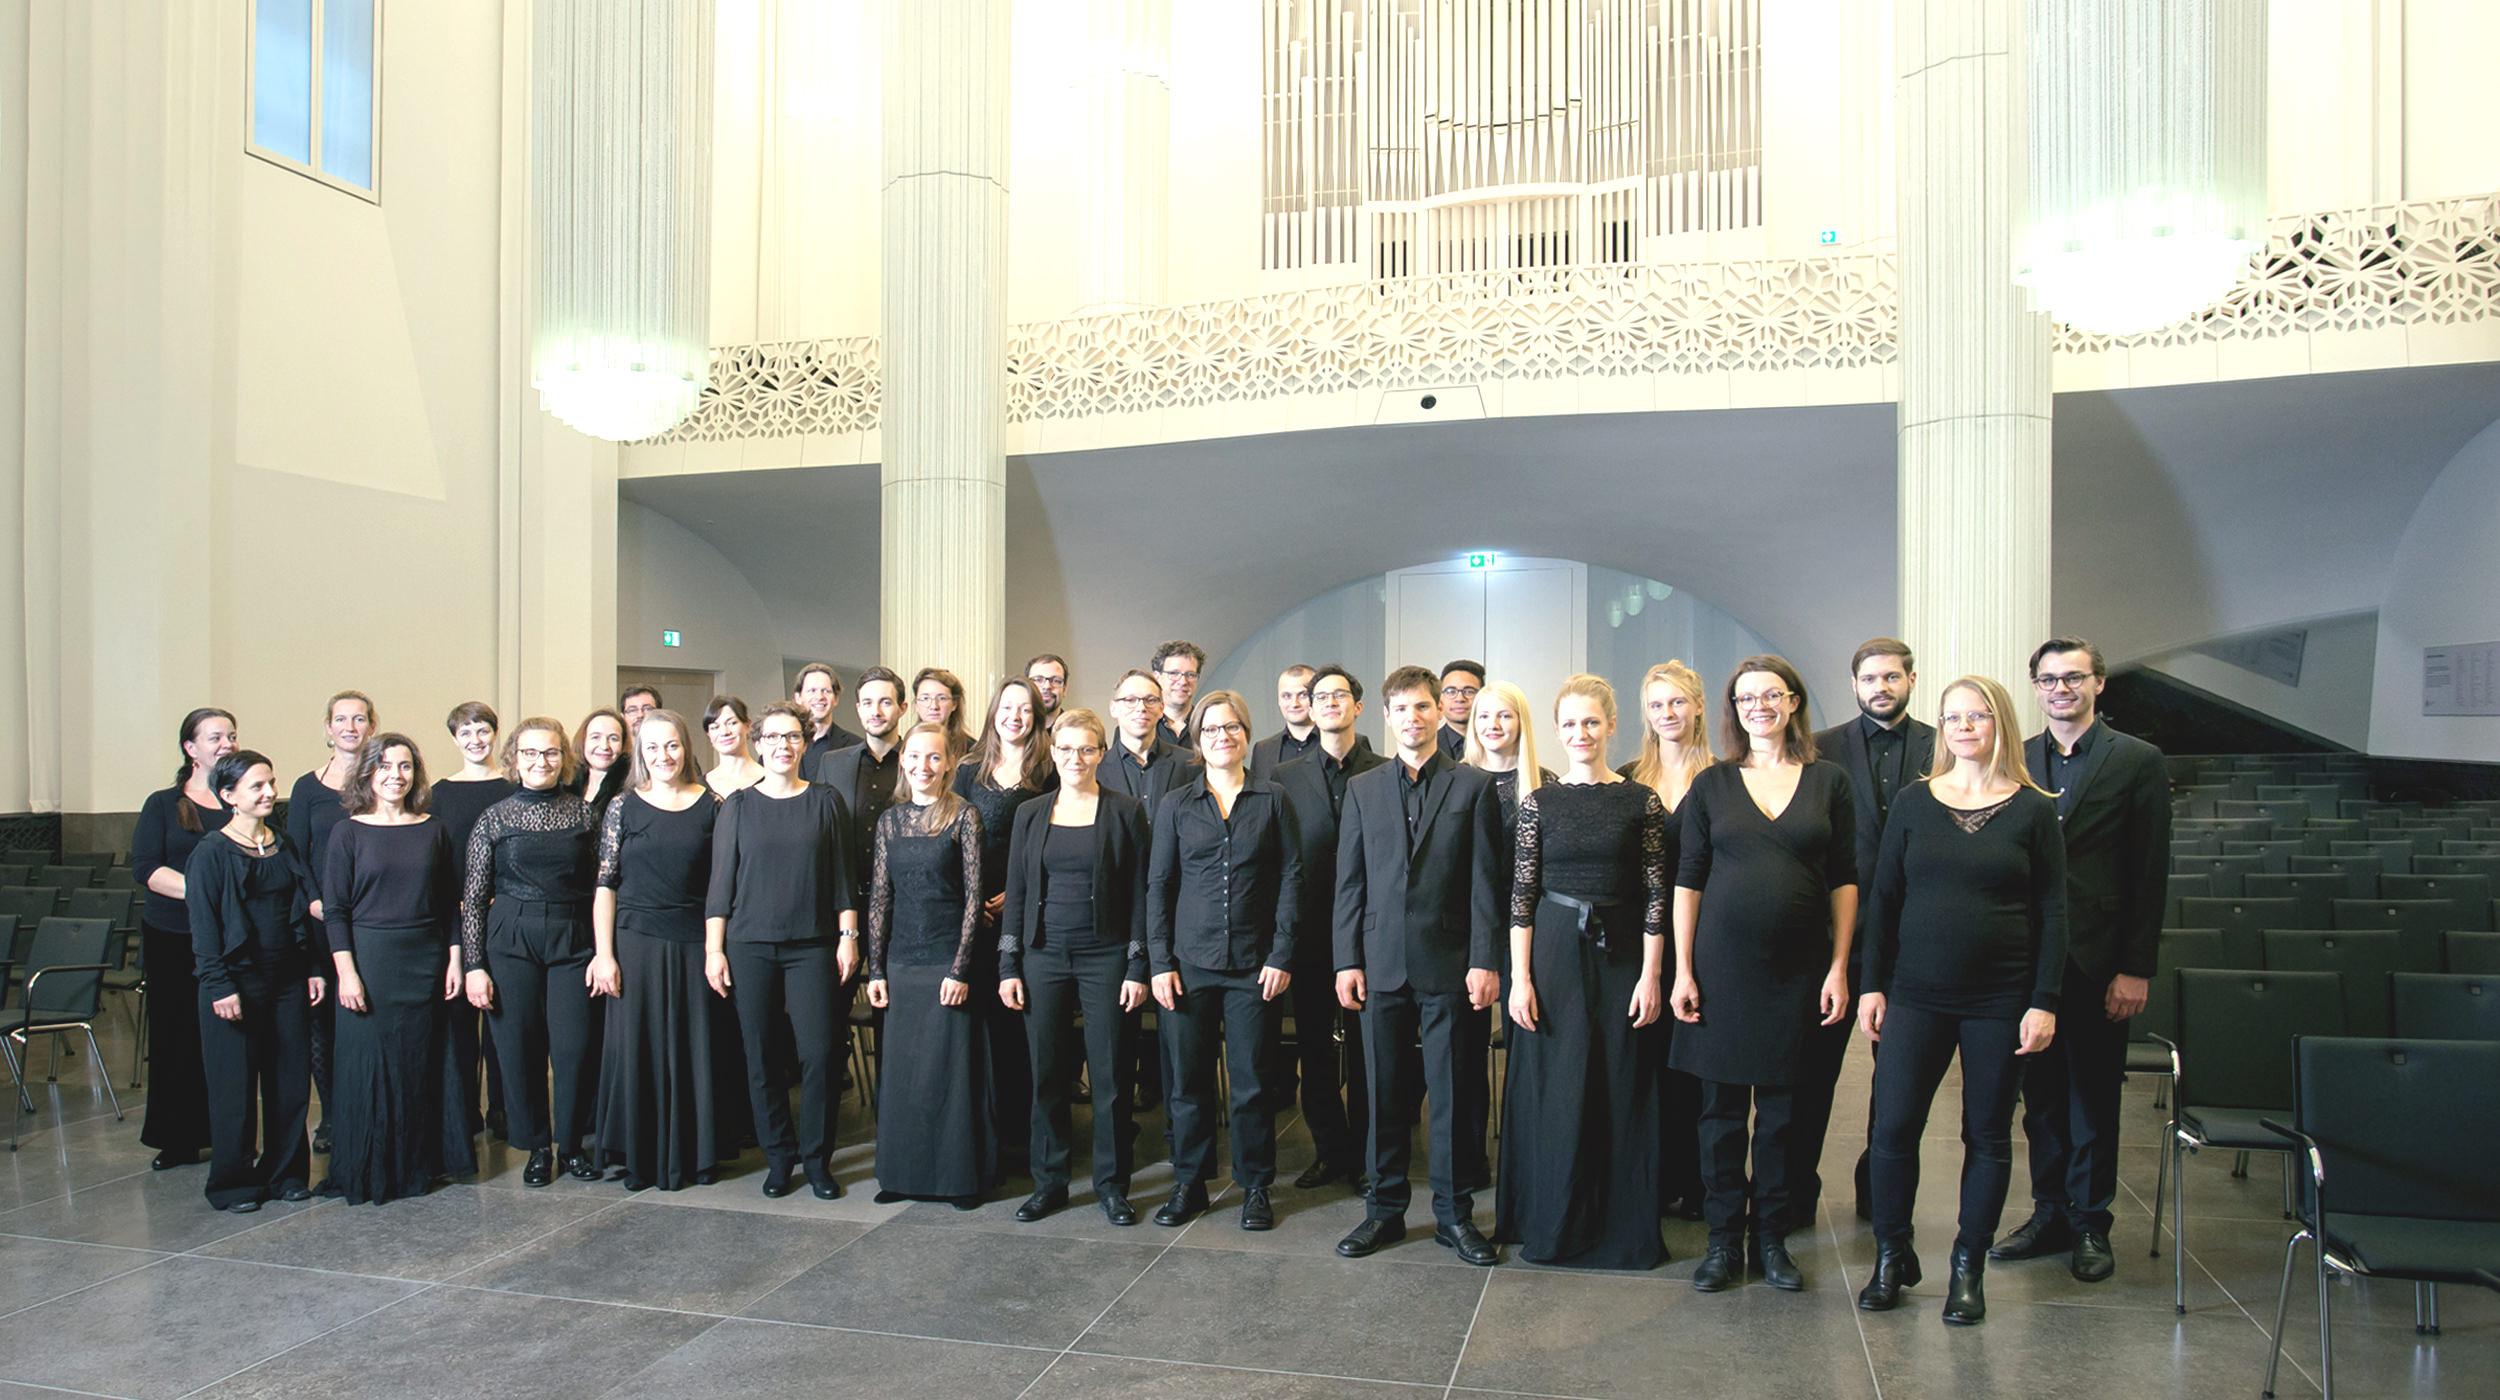 Vocalconsort_Leipzig_2.jpg